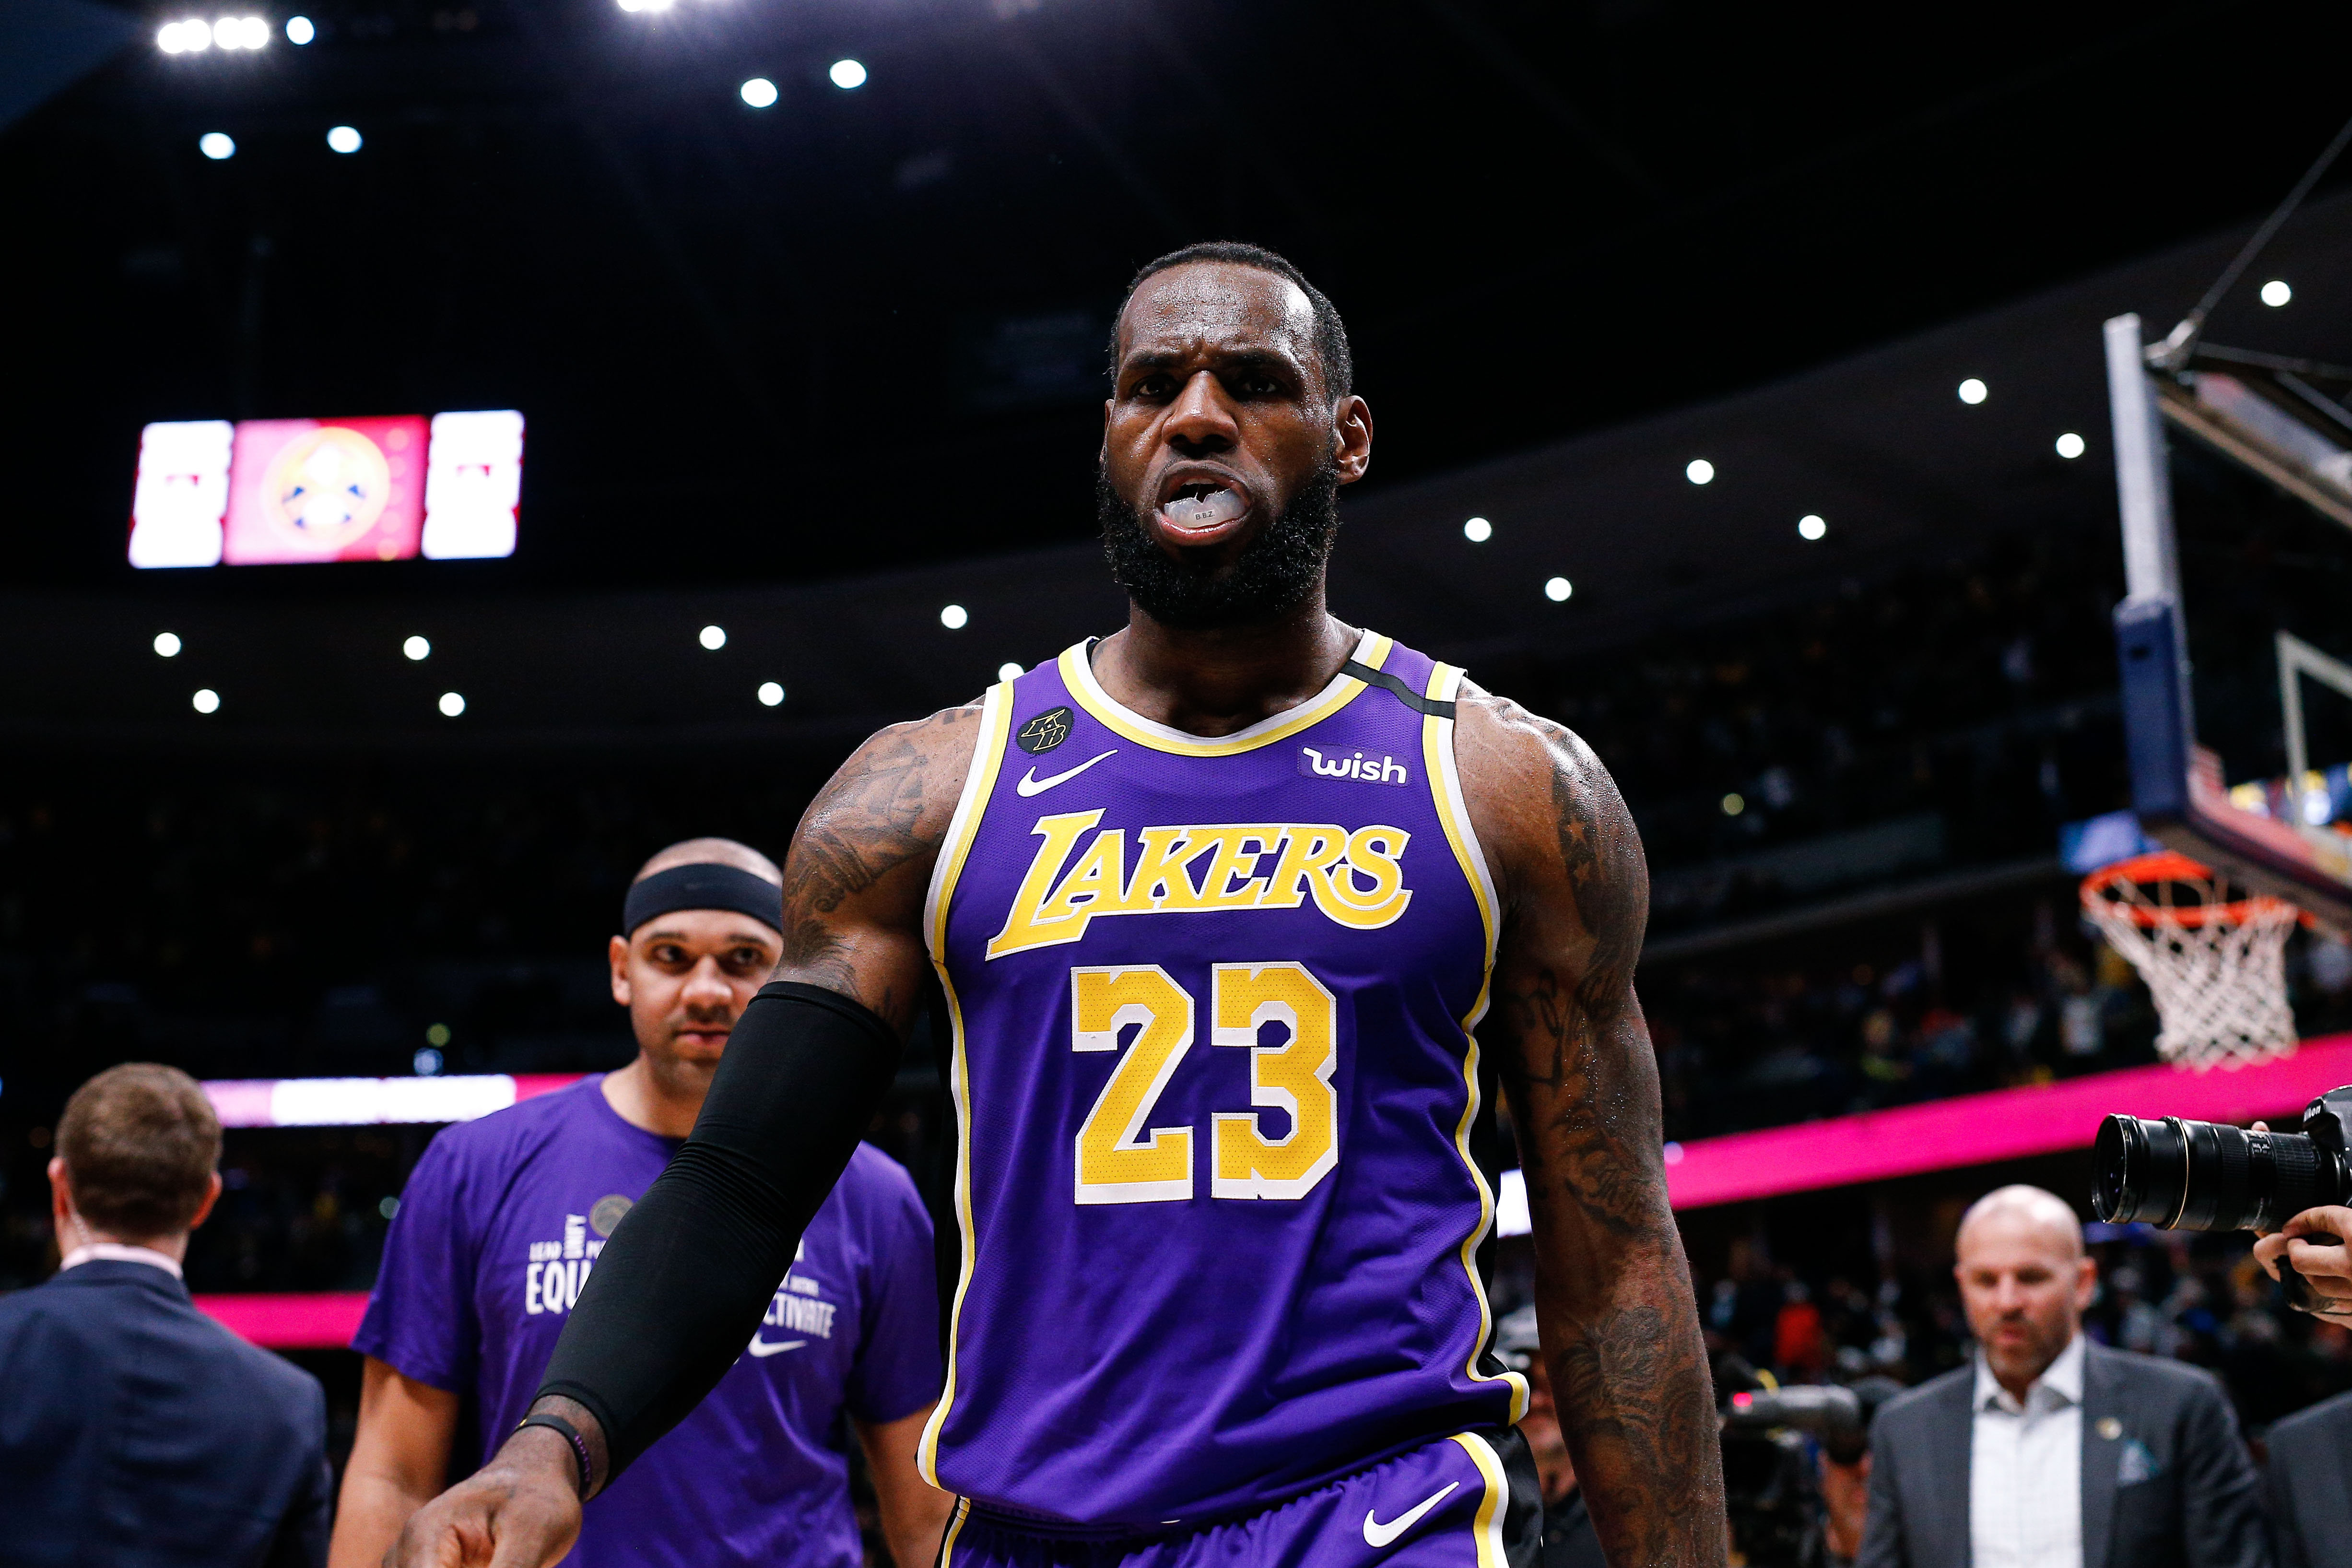 Tristan Thompson reveals LeBron James has 'worst f---ing diet ever'